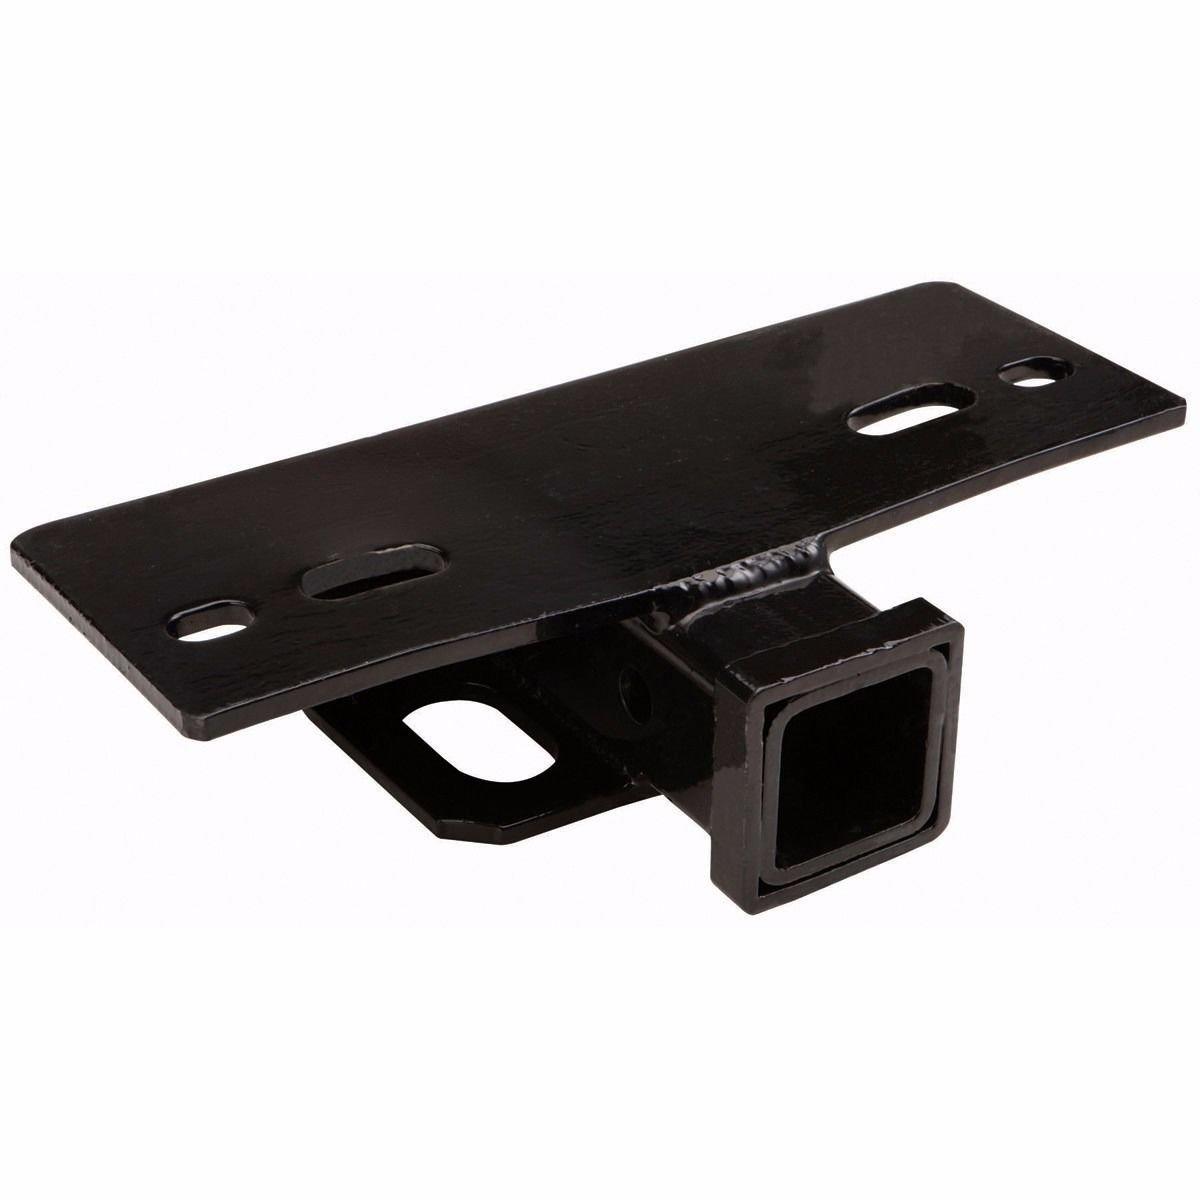 WennoW Step Bumper Receiver Hitch 2 Reciever Trailer 5000lb Capacity New